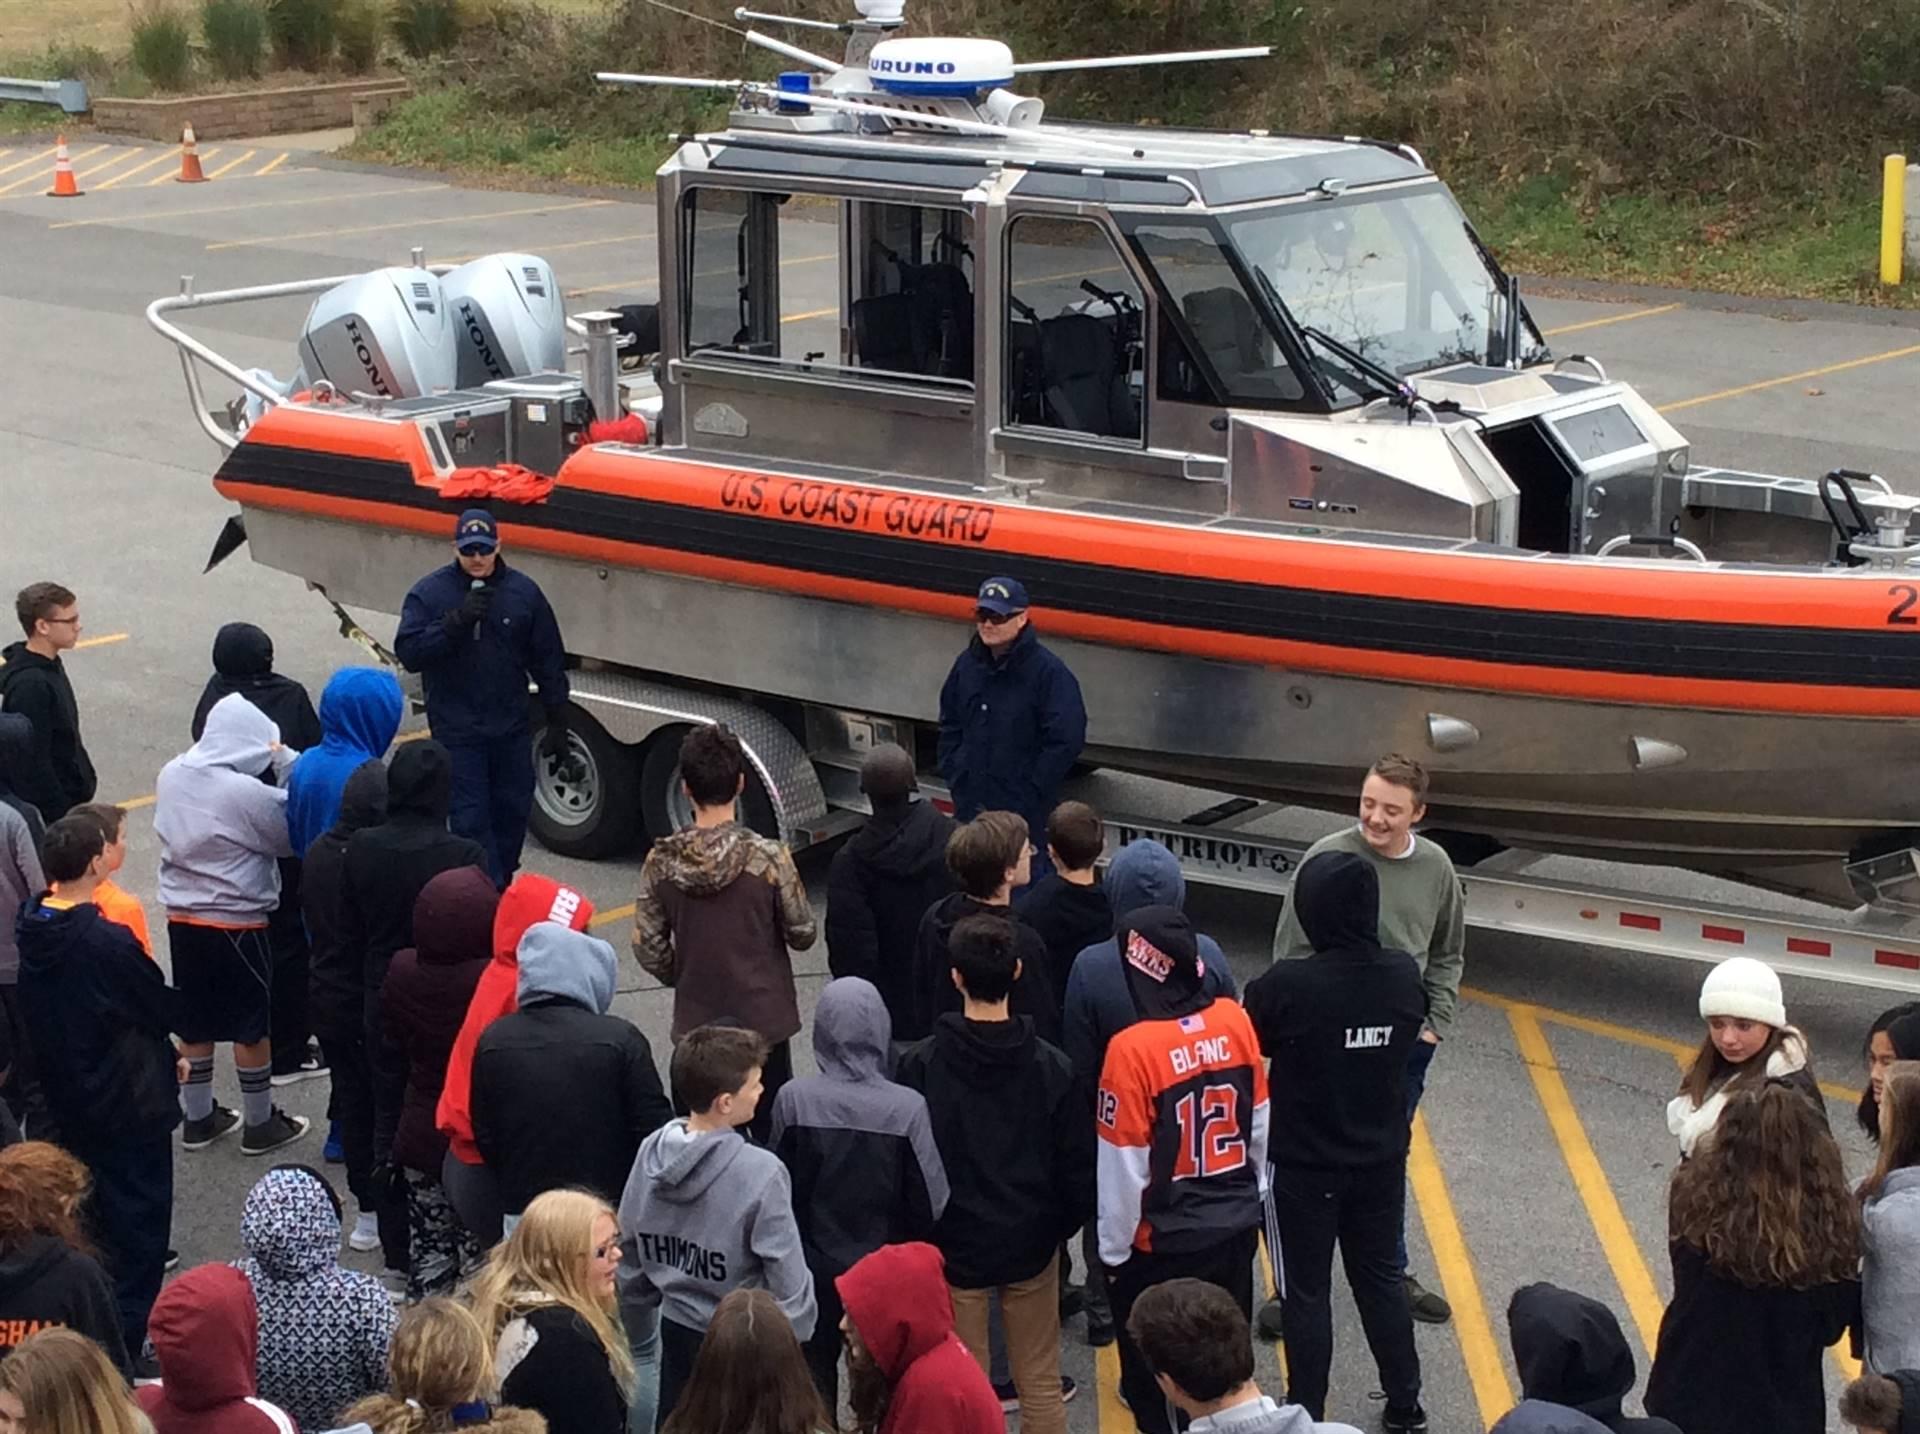 Waiting to get a close up look at a Coast Guard Boat